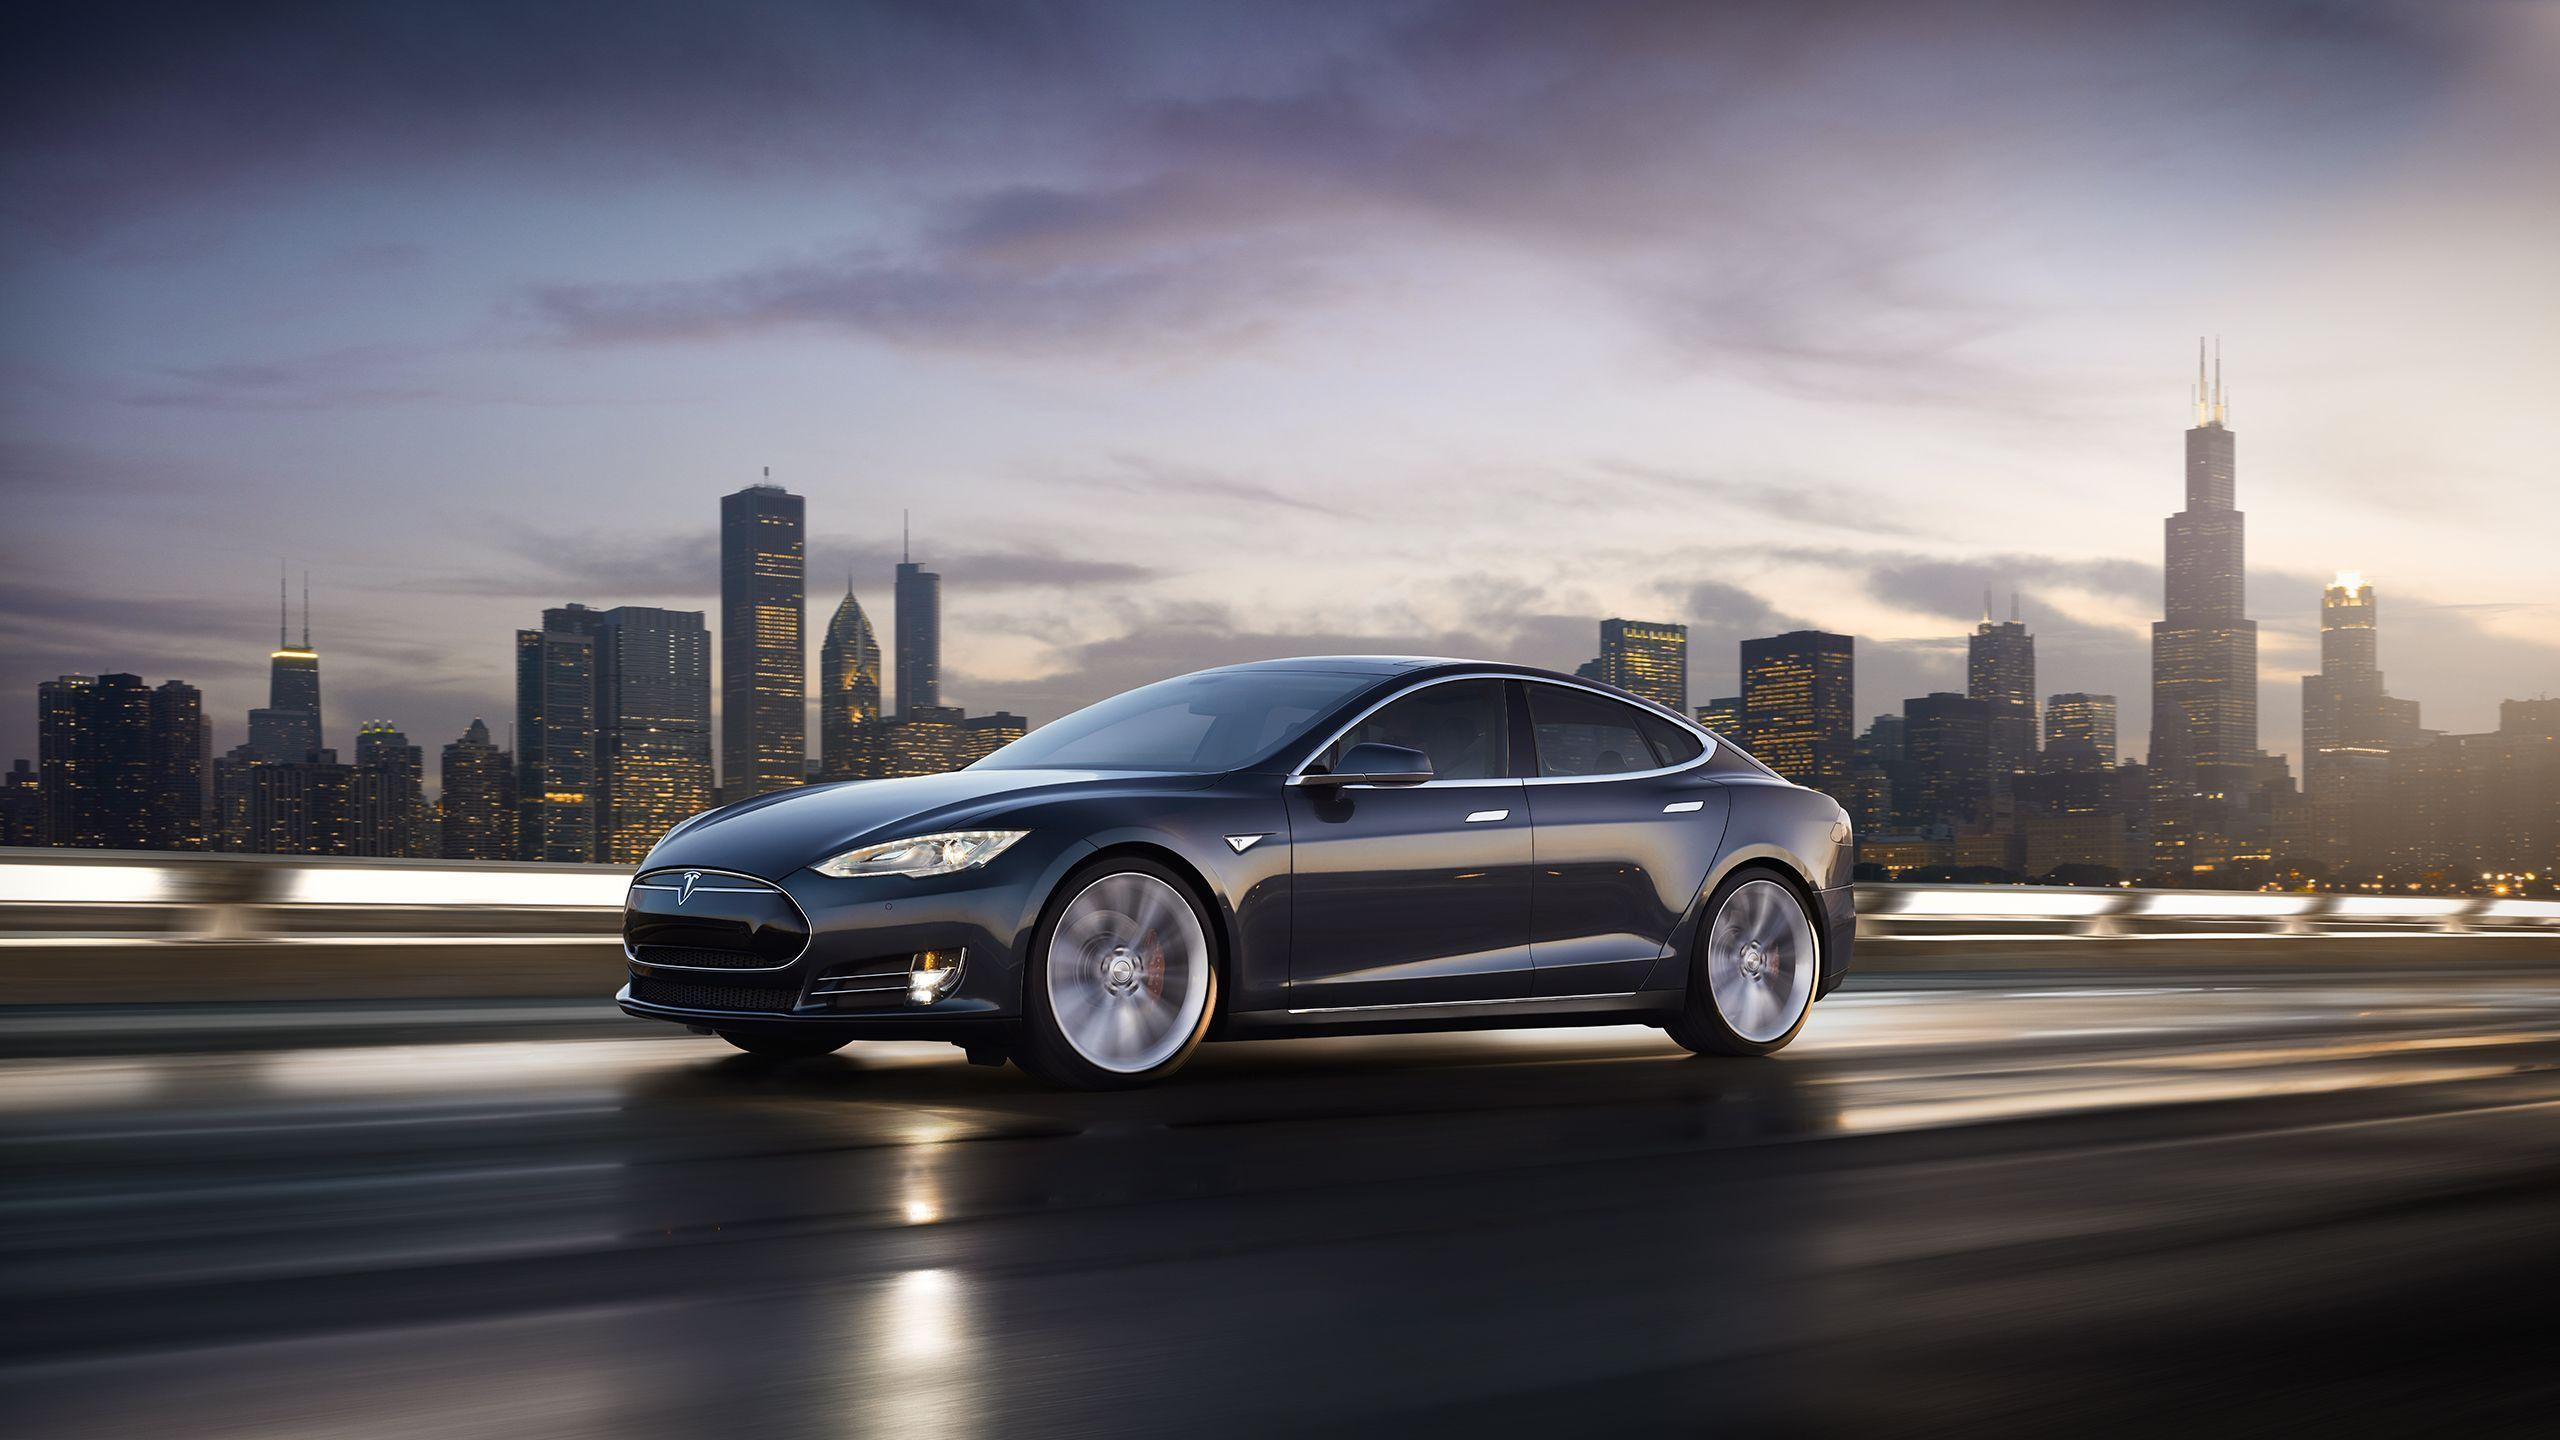 Tesla Wallpapers 2560x1440